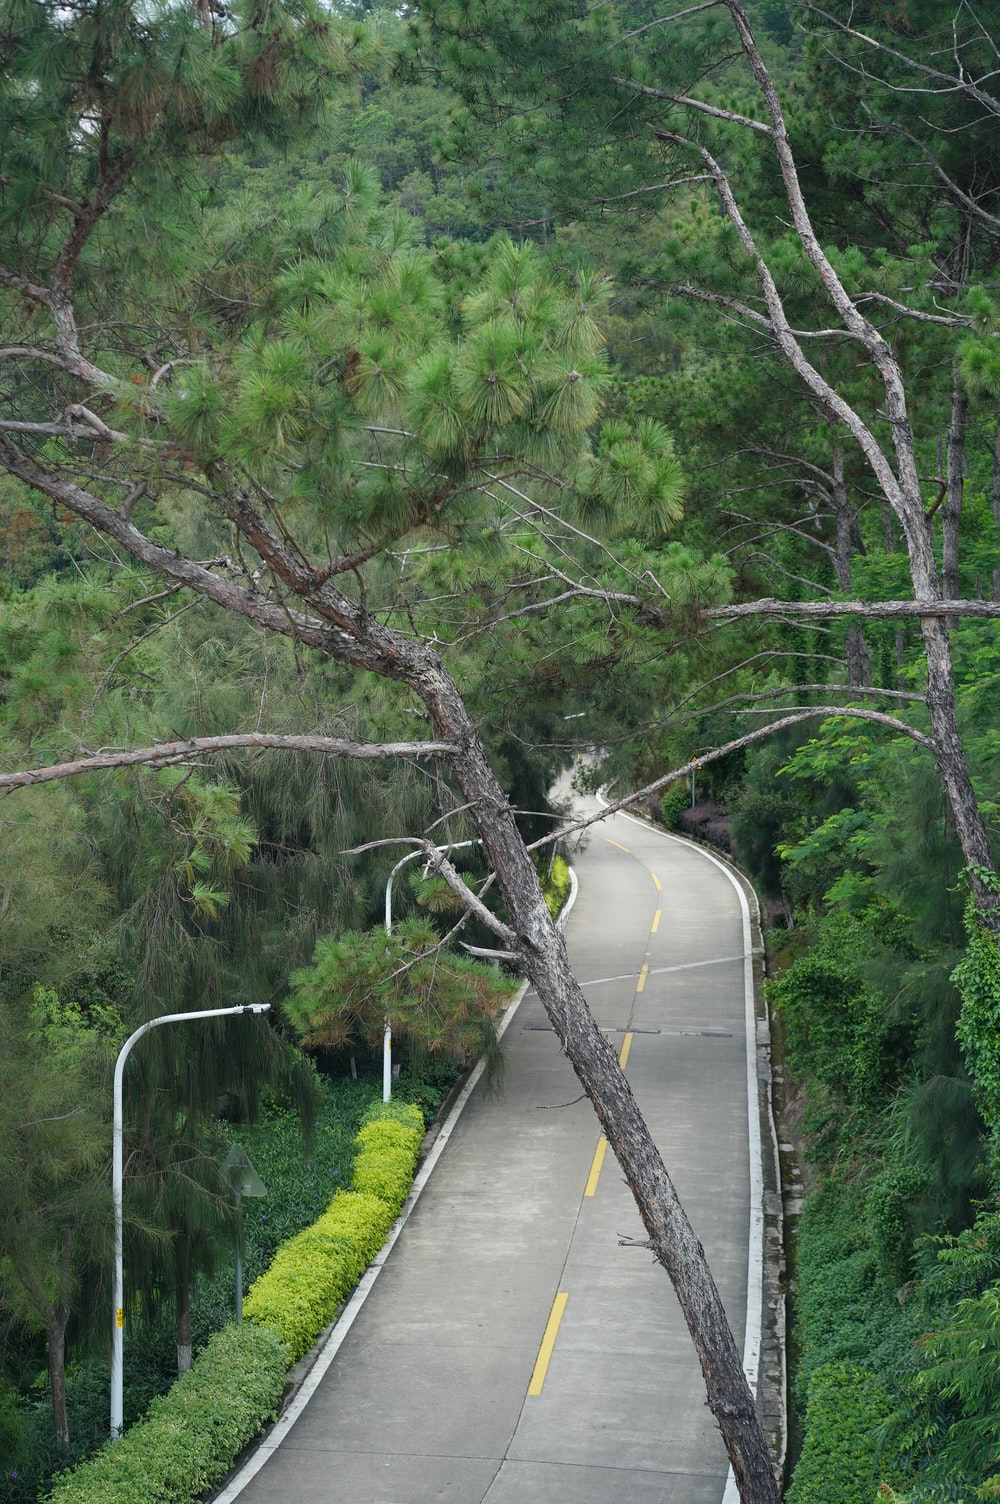 green trees on gray concrete bridge during daytime